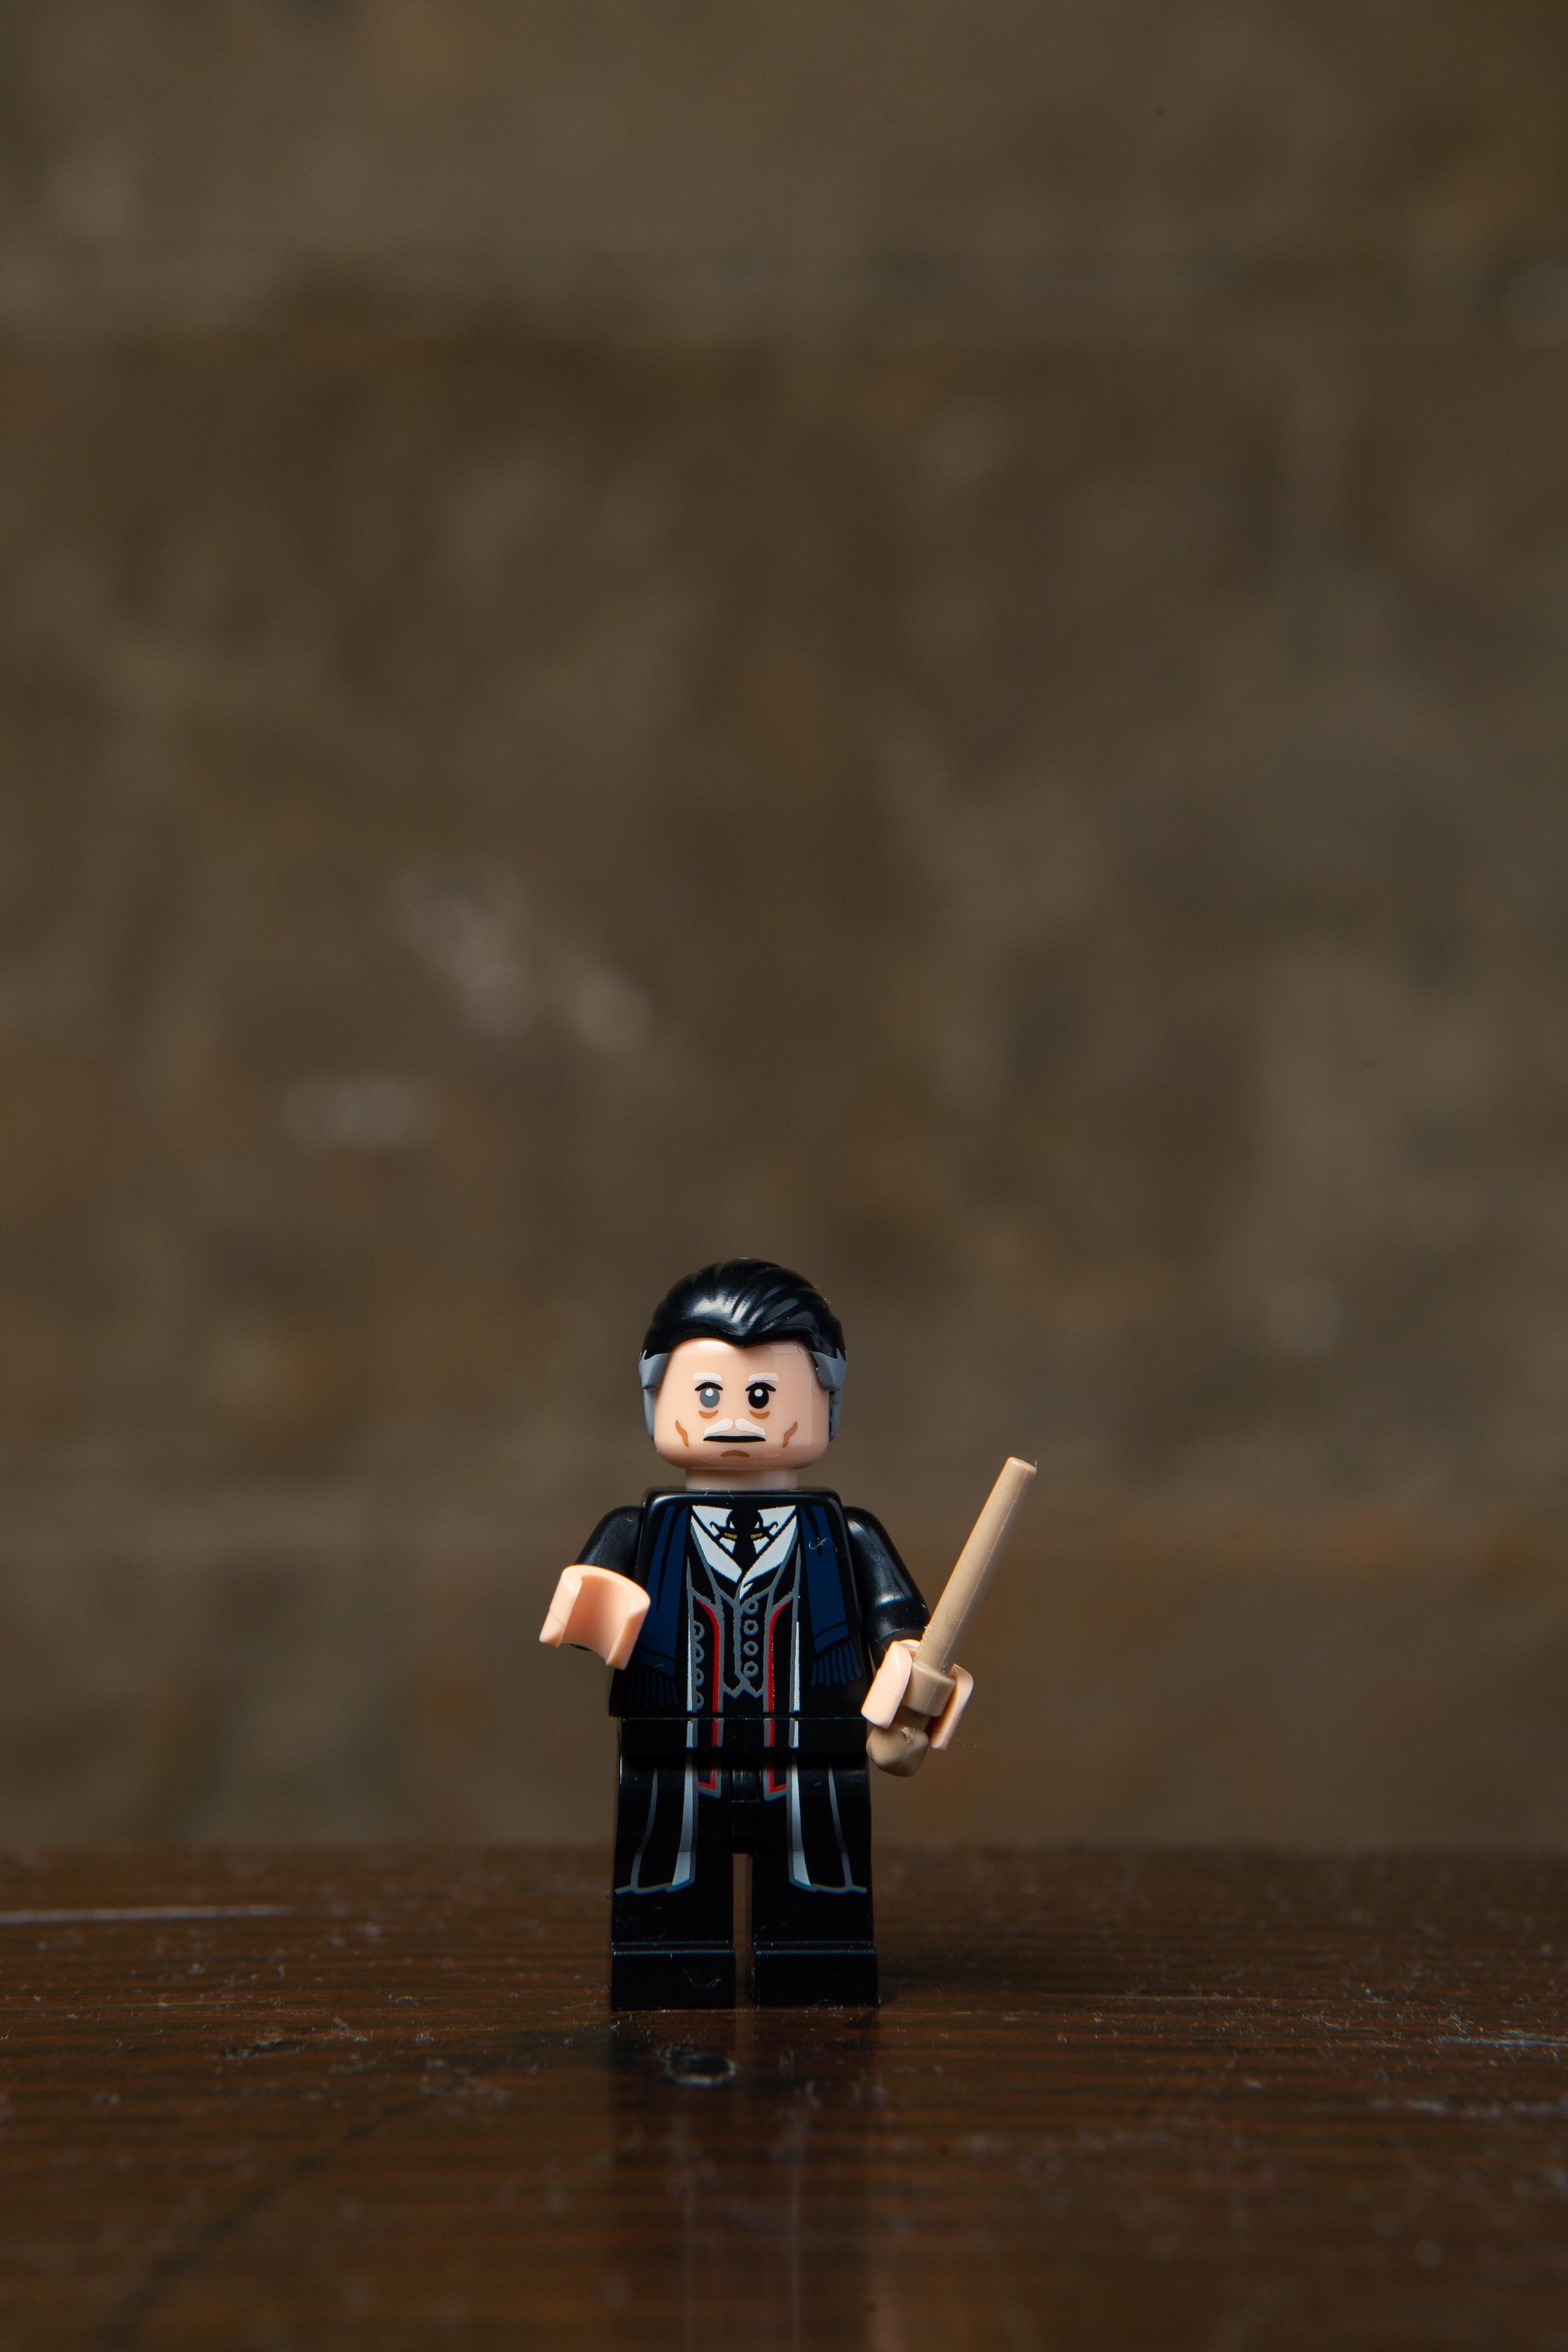 LEGO_WBST_19.06.18_hi-res-11.jpg